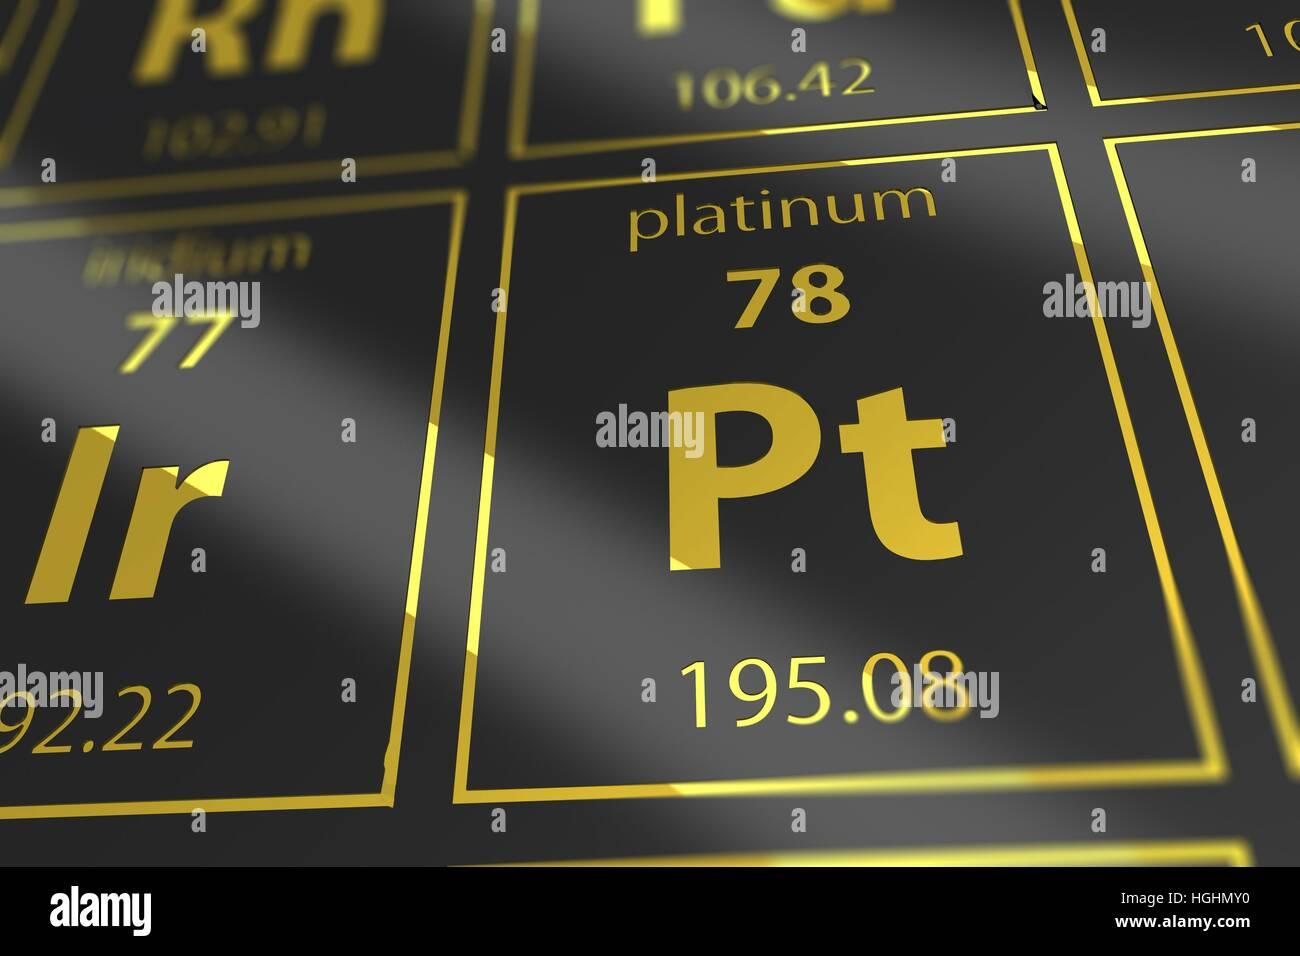 Platinum chemical element imgenes de stock platinum chemical tabla peridica de elementos qumicos platinum closeup ilustracin 3d prestados tabla de mendeleev imagen de urtaz Gallery